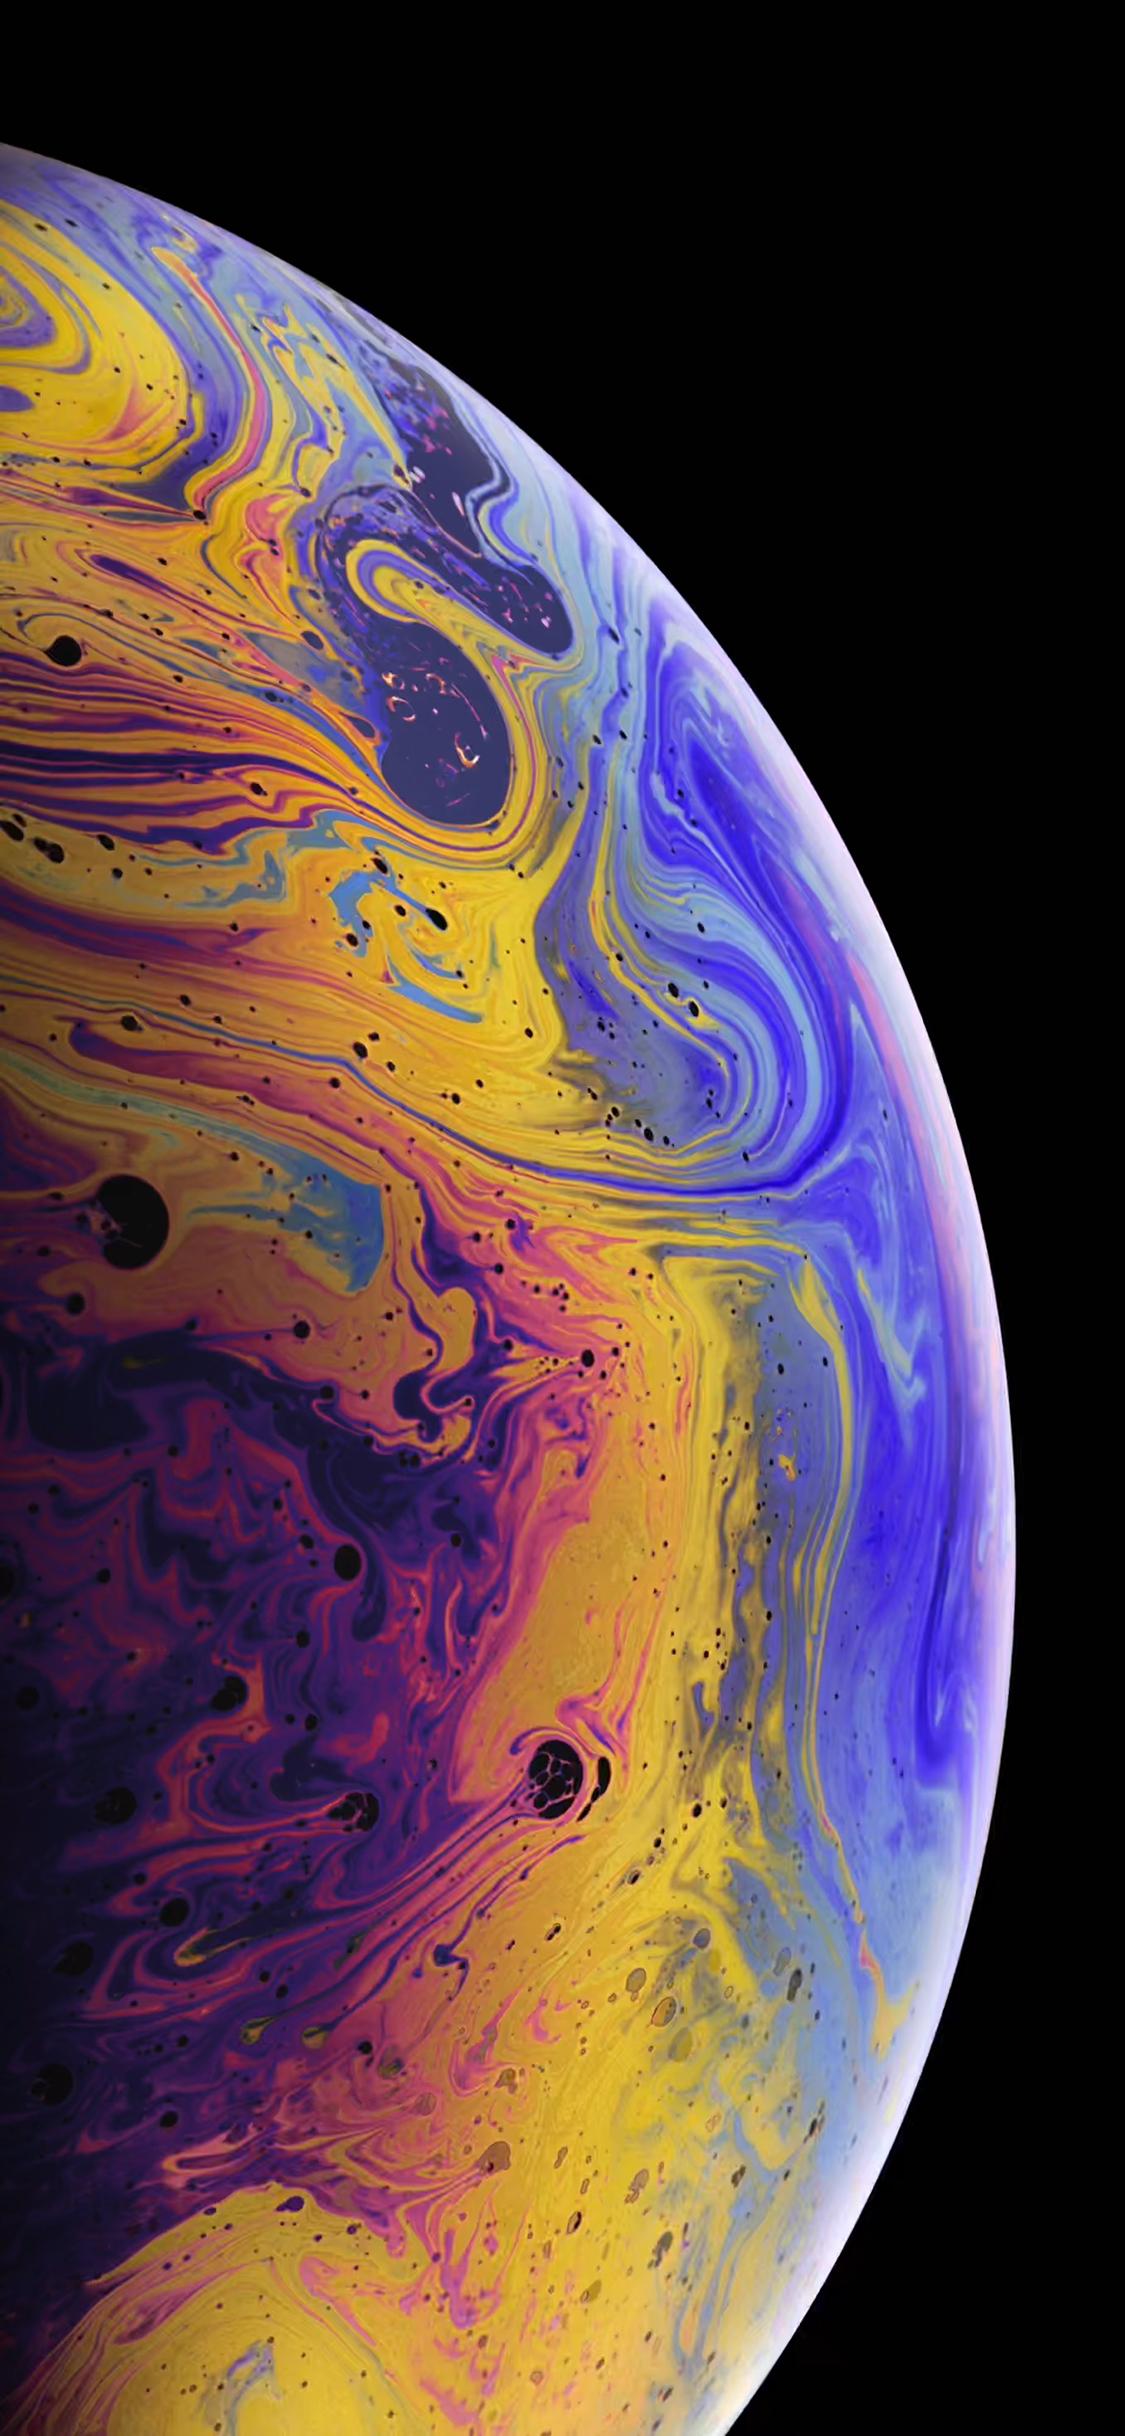 Iphonex Ios11 Ios12 Lockscreen Homescreen Backgrounds Apple Iphone Imagem De Fundo Para Iphone Papel De Parede Para Iphone Papel De Parede Smartphone